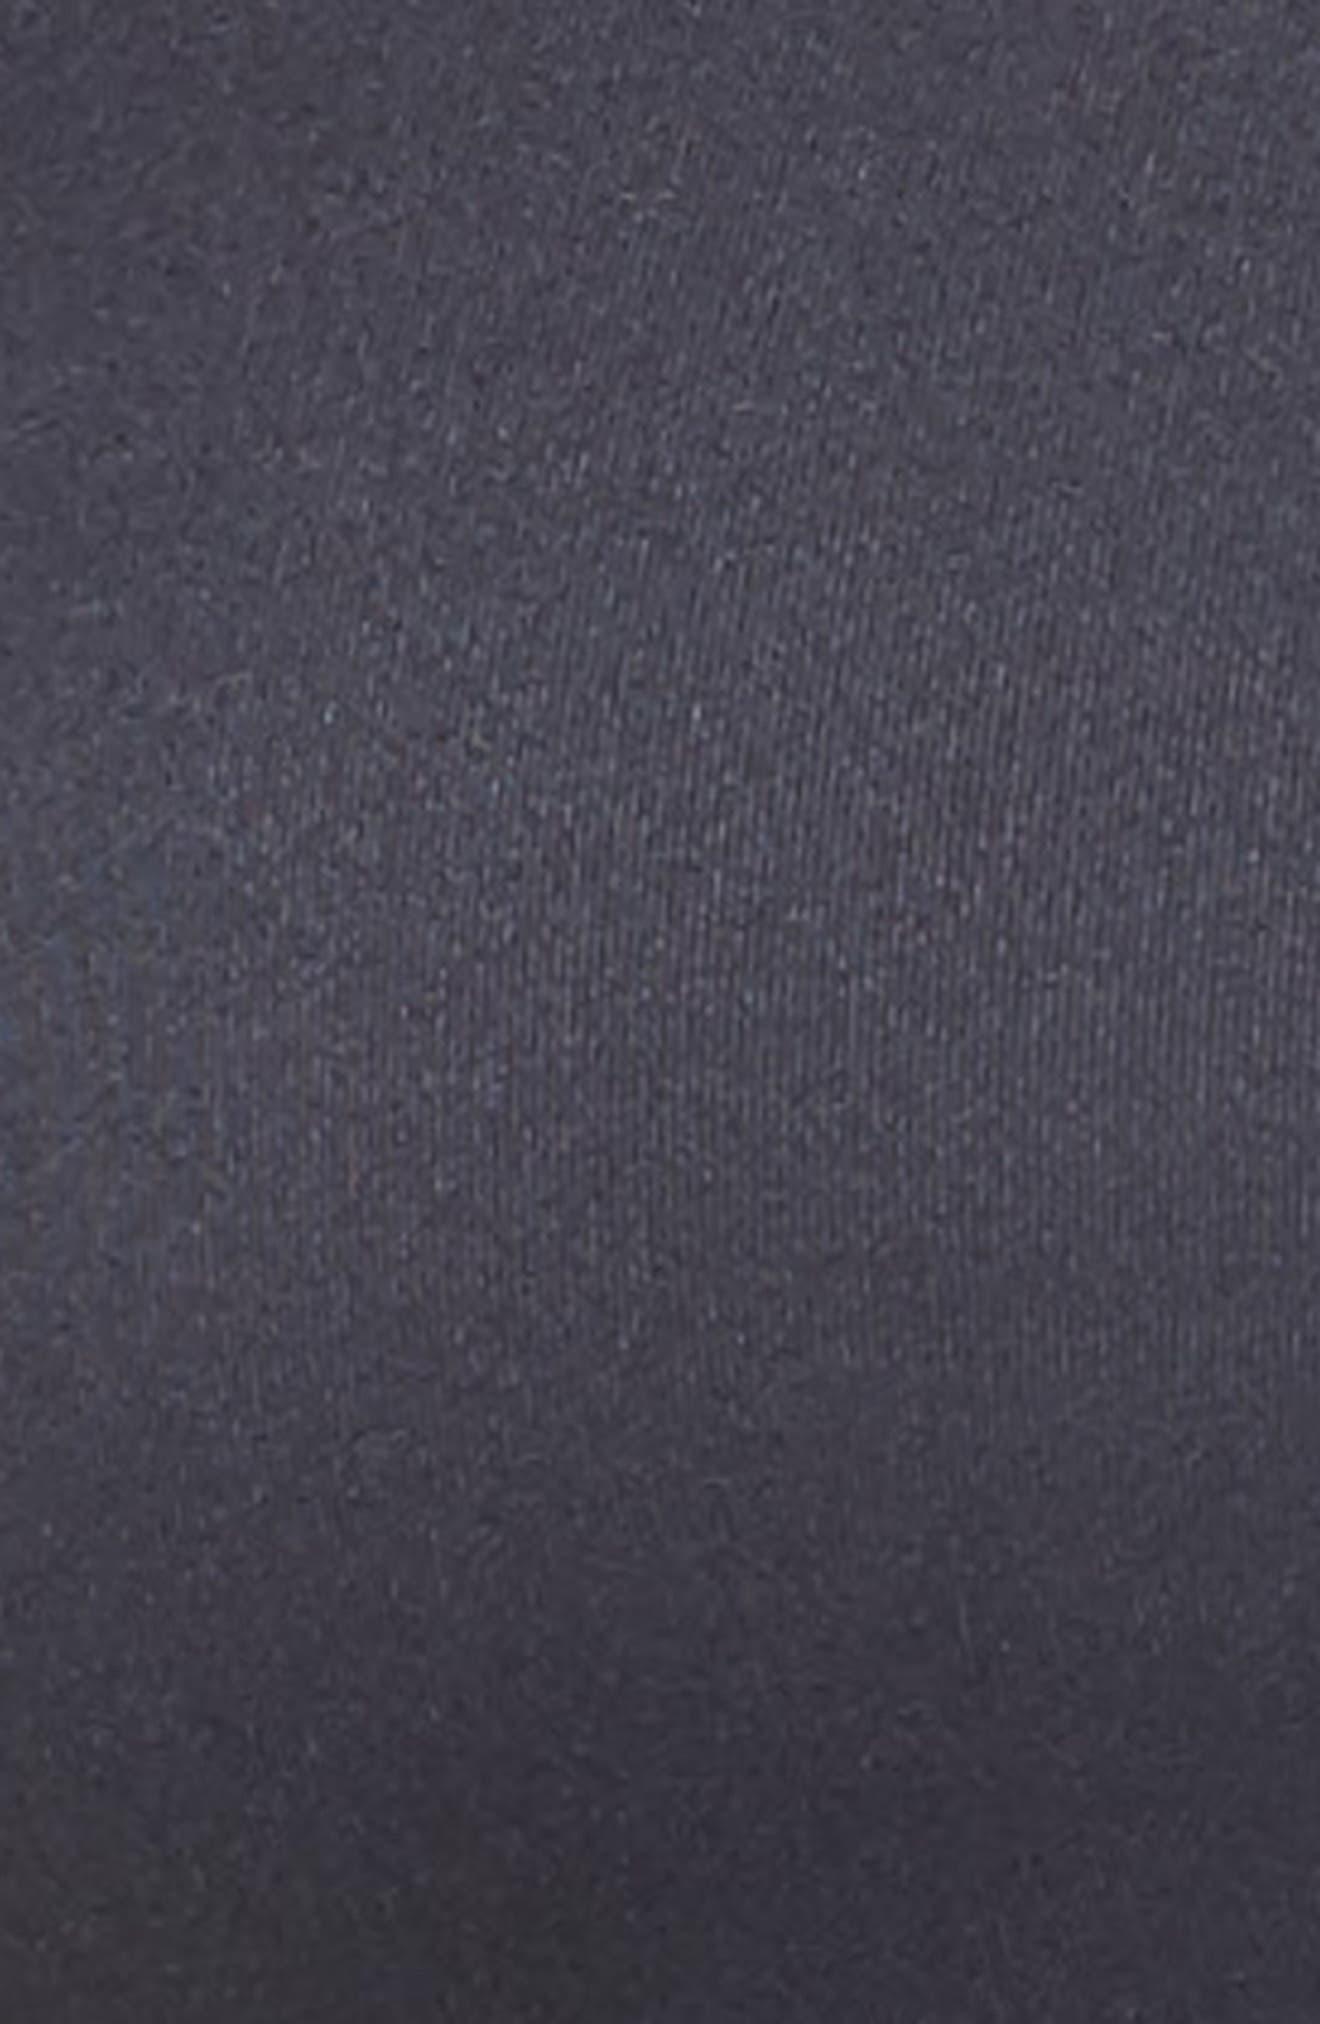 Crown Sports Bra,                             Alternate thumbnail 6, color,                             Sapphire Black